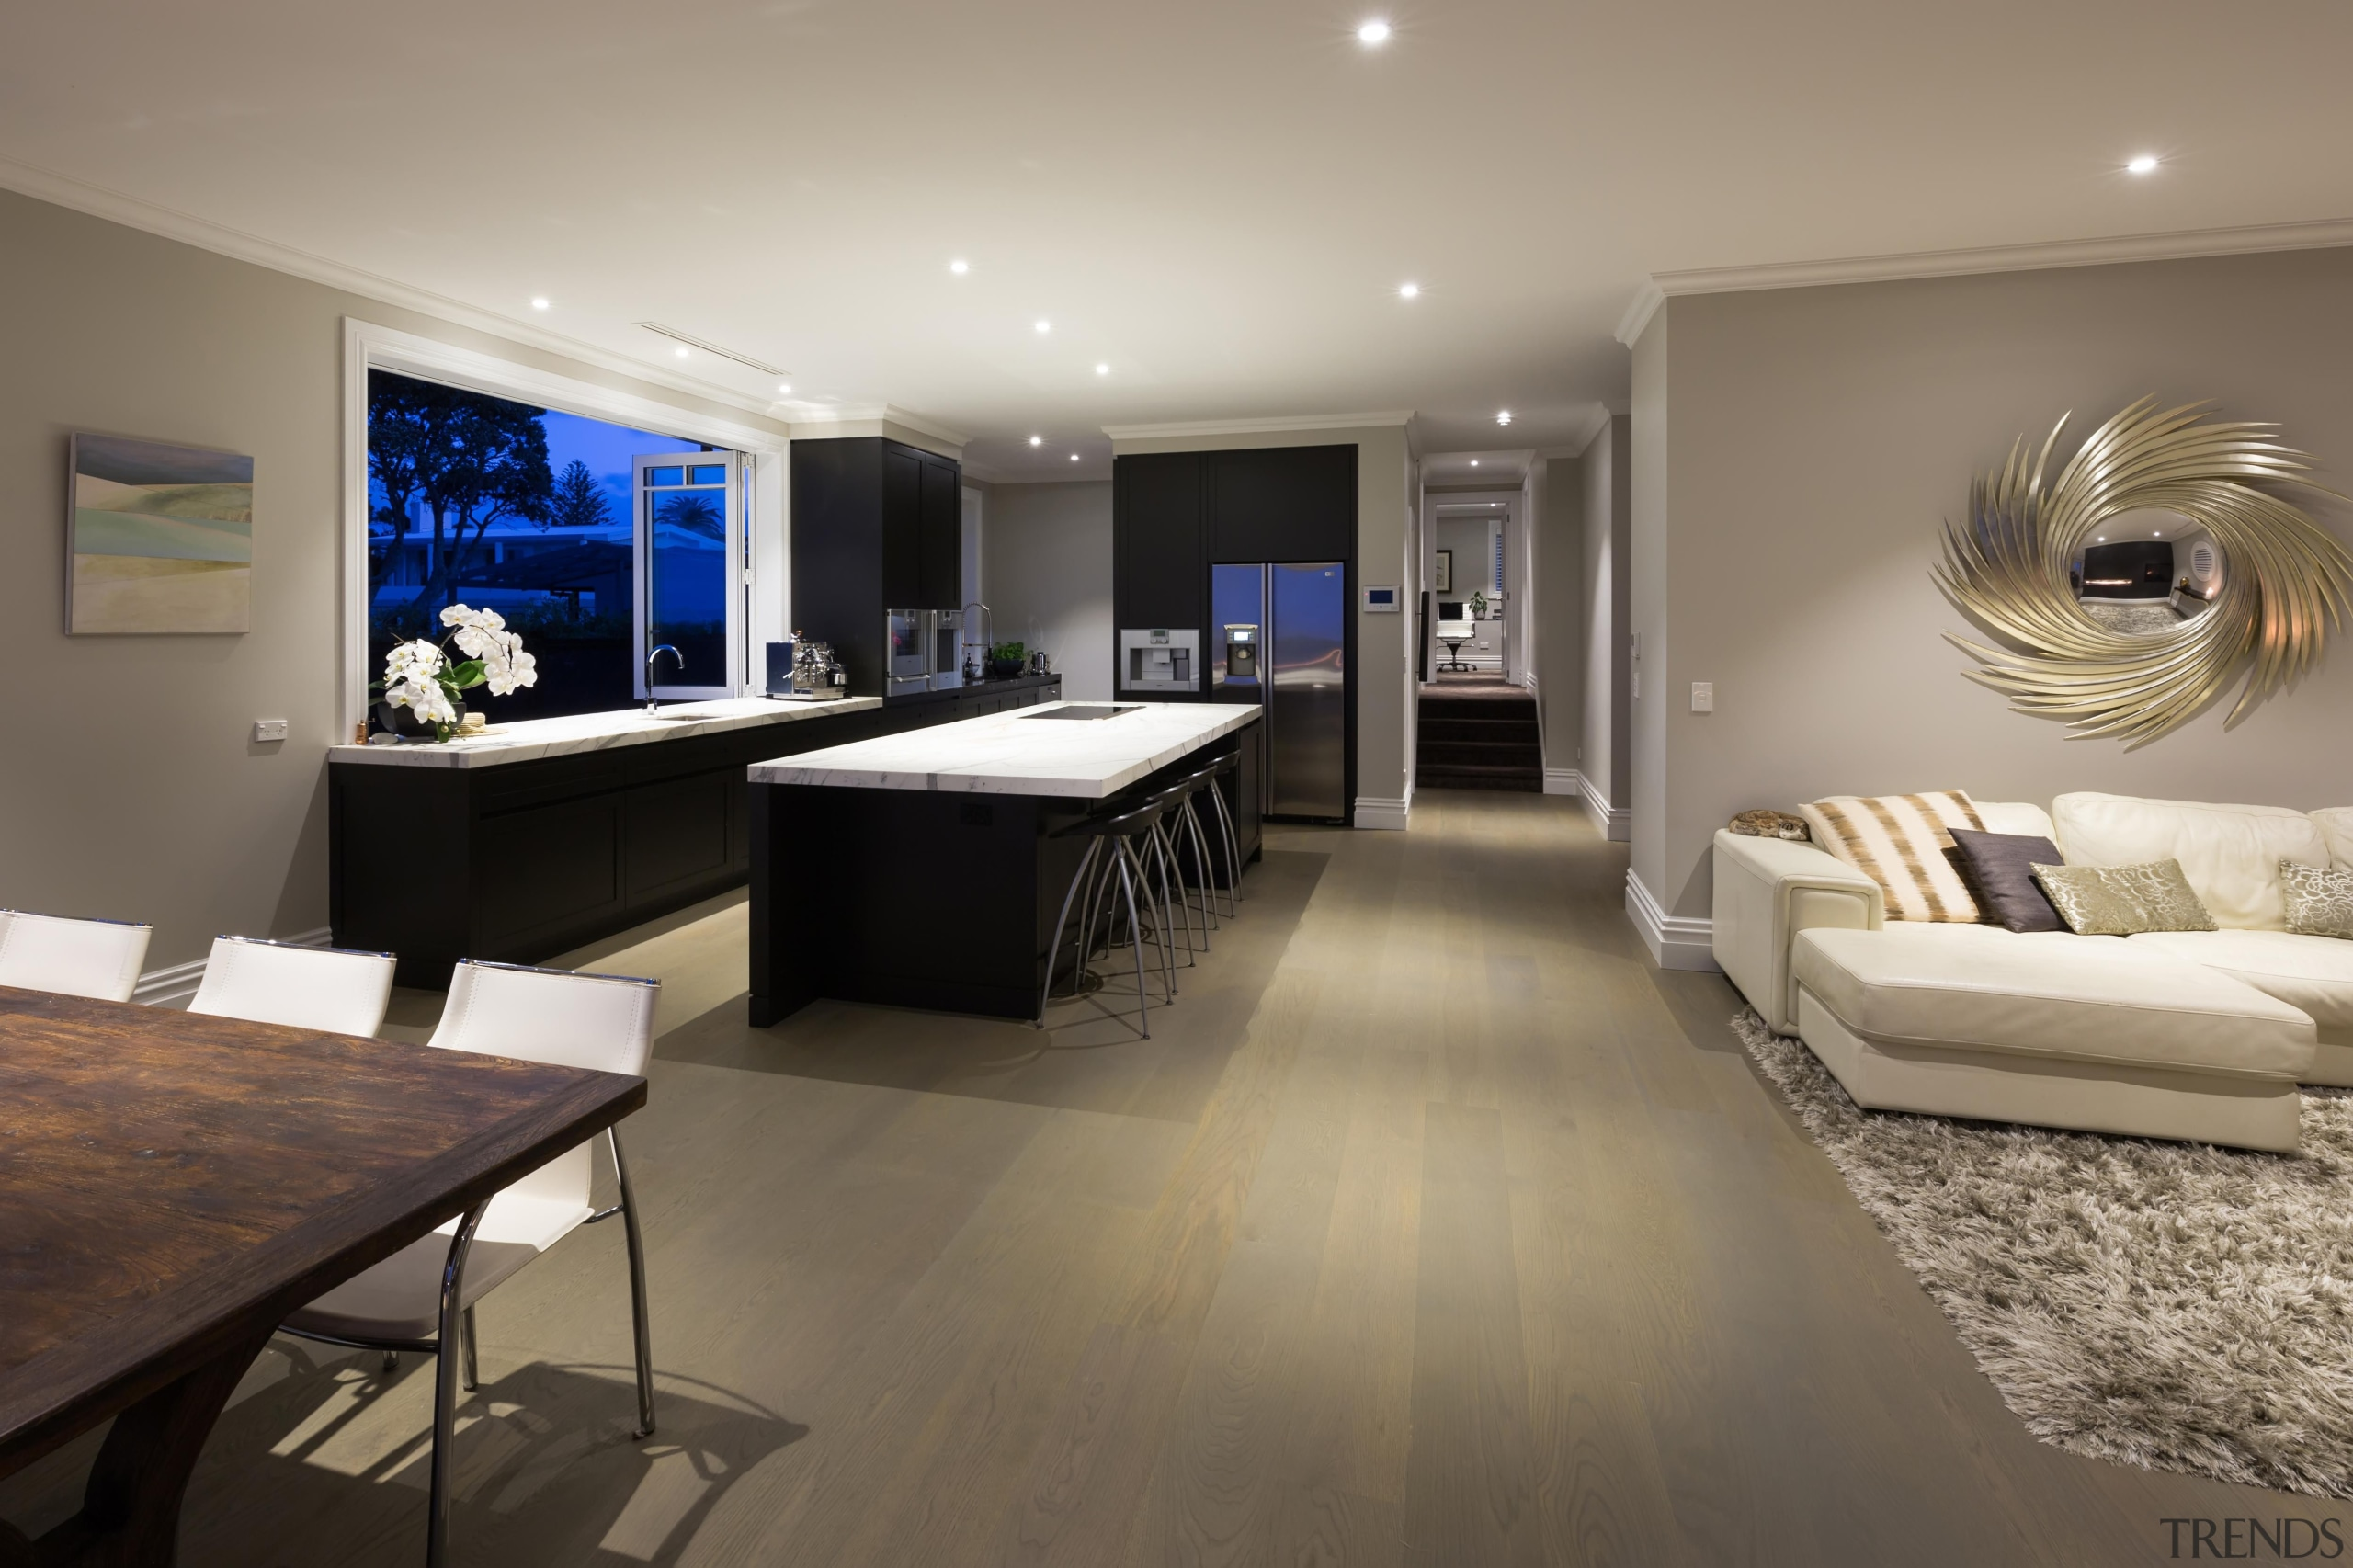 21 living after - Living After - floor floor, flooring, interior design, living room, real estate, room, gray, brown